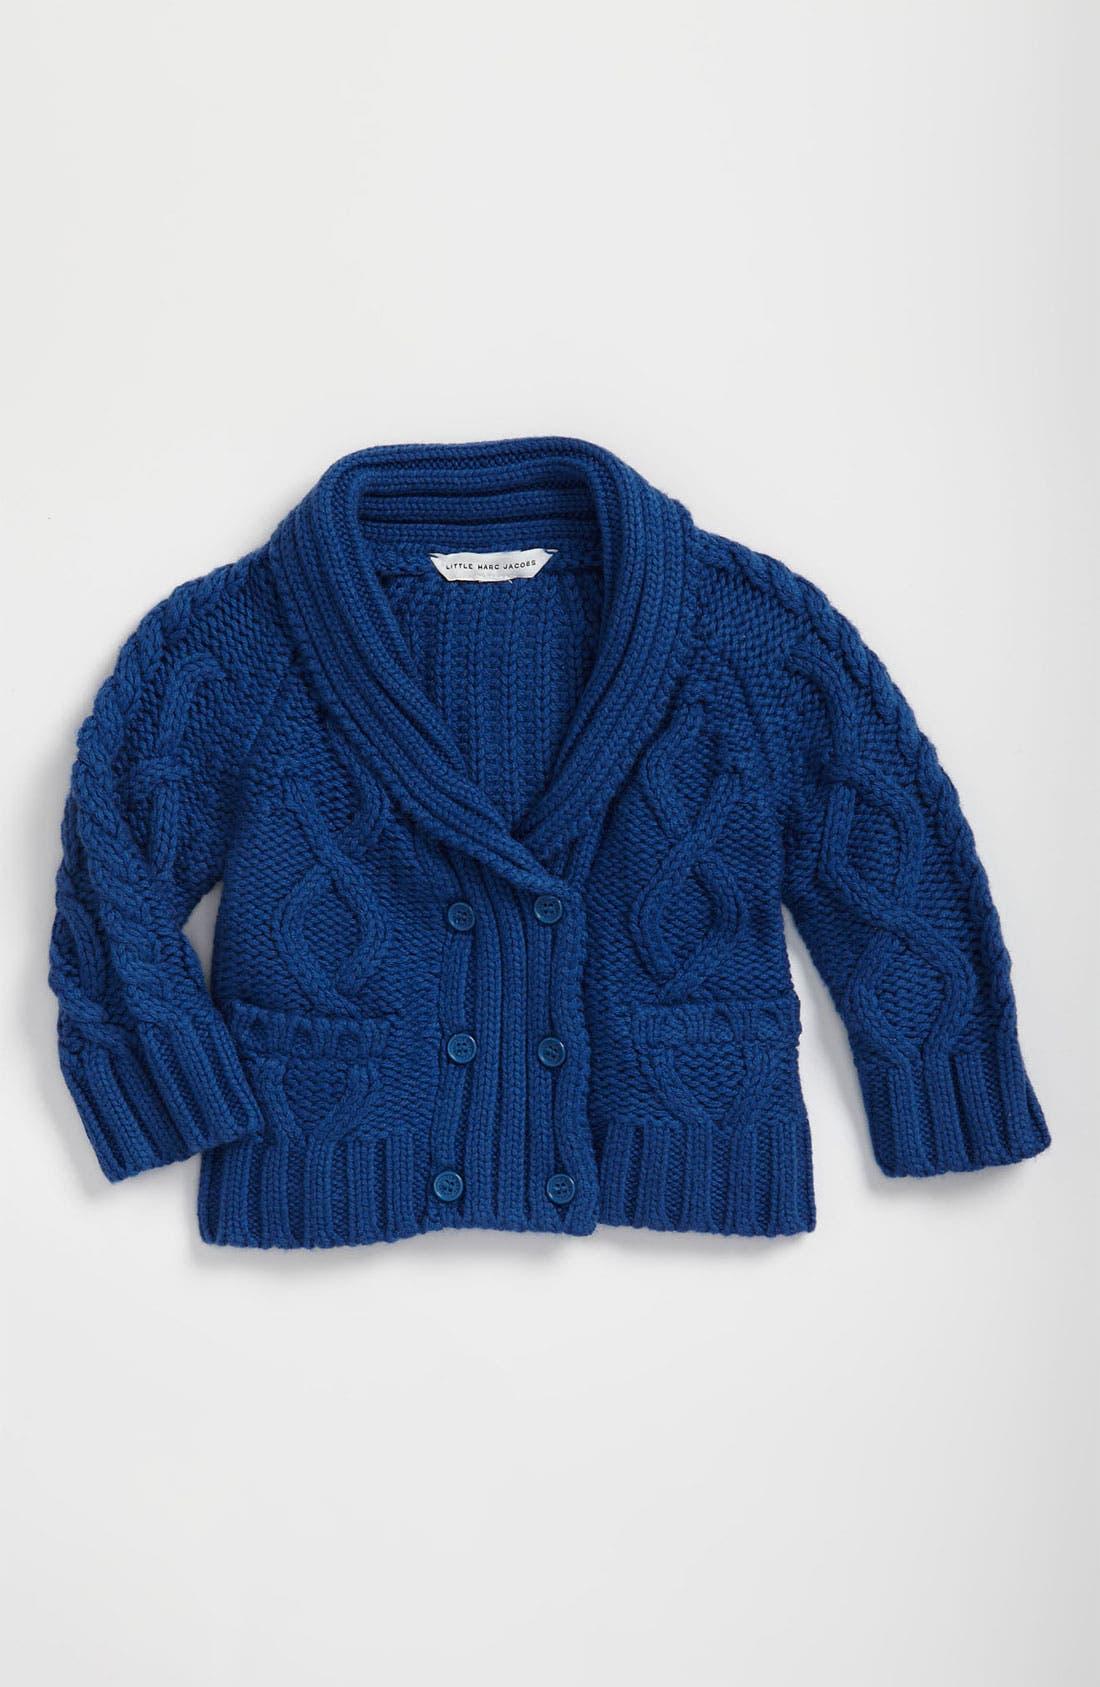 Alternate Image 1 Selected - LITTLE MARC JACOBS Knit Cardigan (Infant)